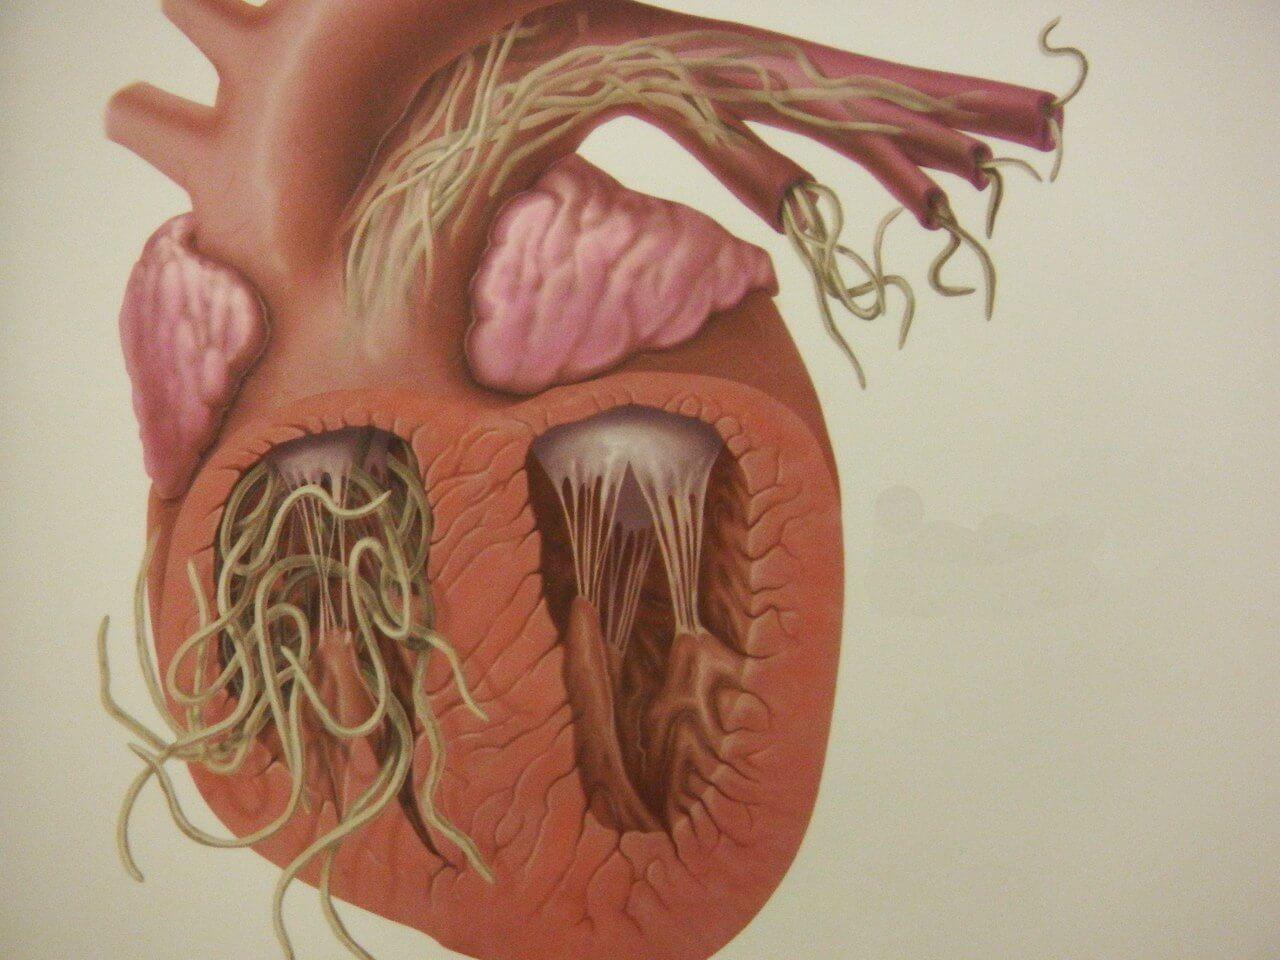 Paraziti s soda paraziti Crijevni paraziti kod pasa, Crijevni paraziti kod ljudi lijecenje